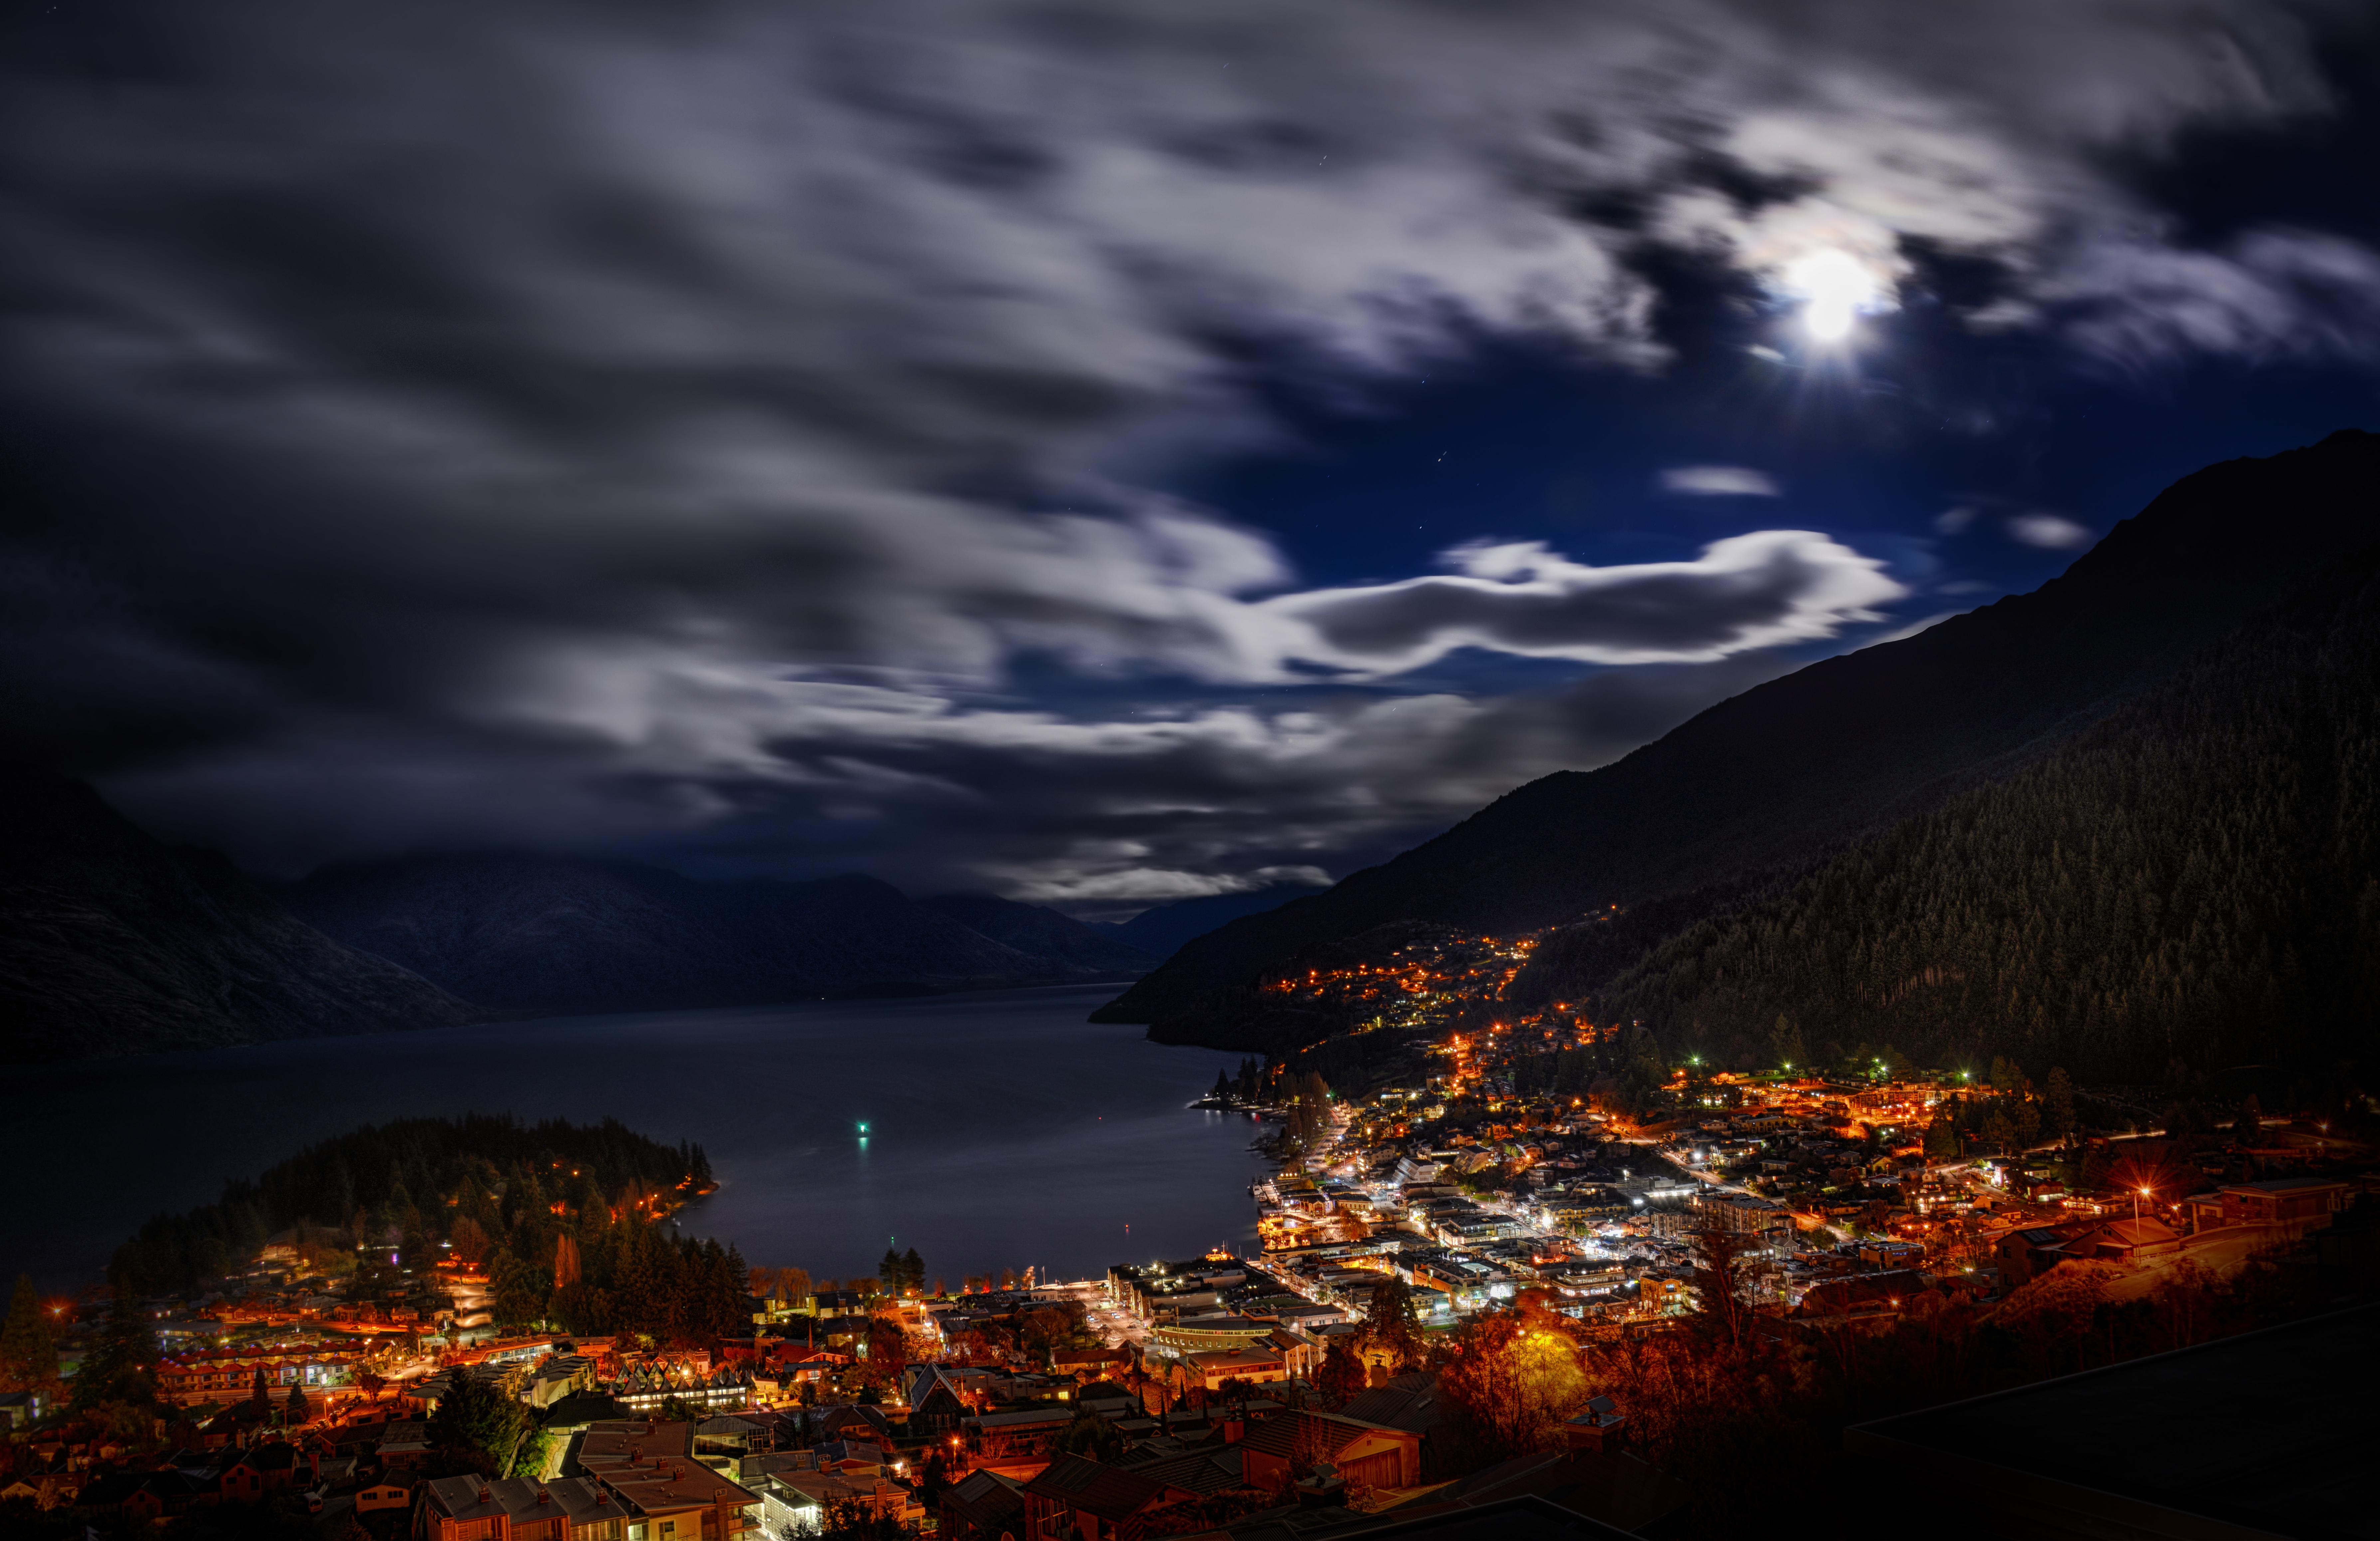 Photo: New Zealand - from Trey Ratcliff at http://www.StuckInCustoms.com